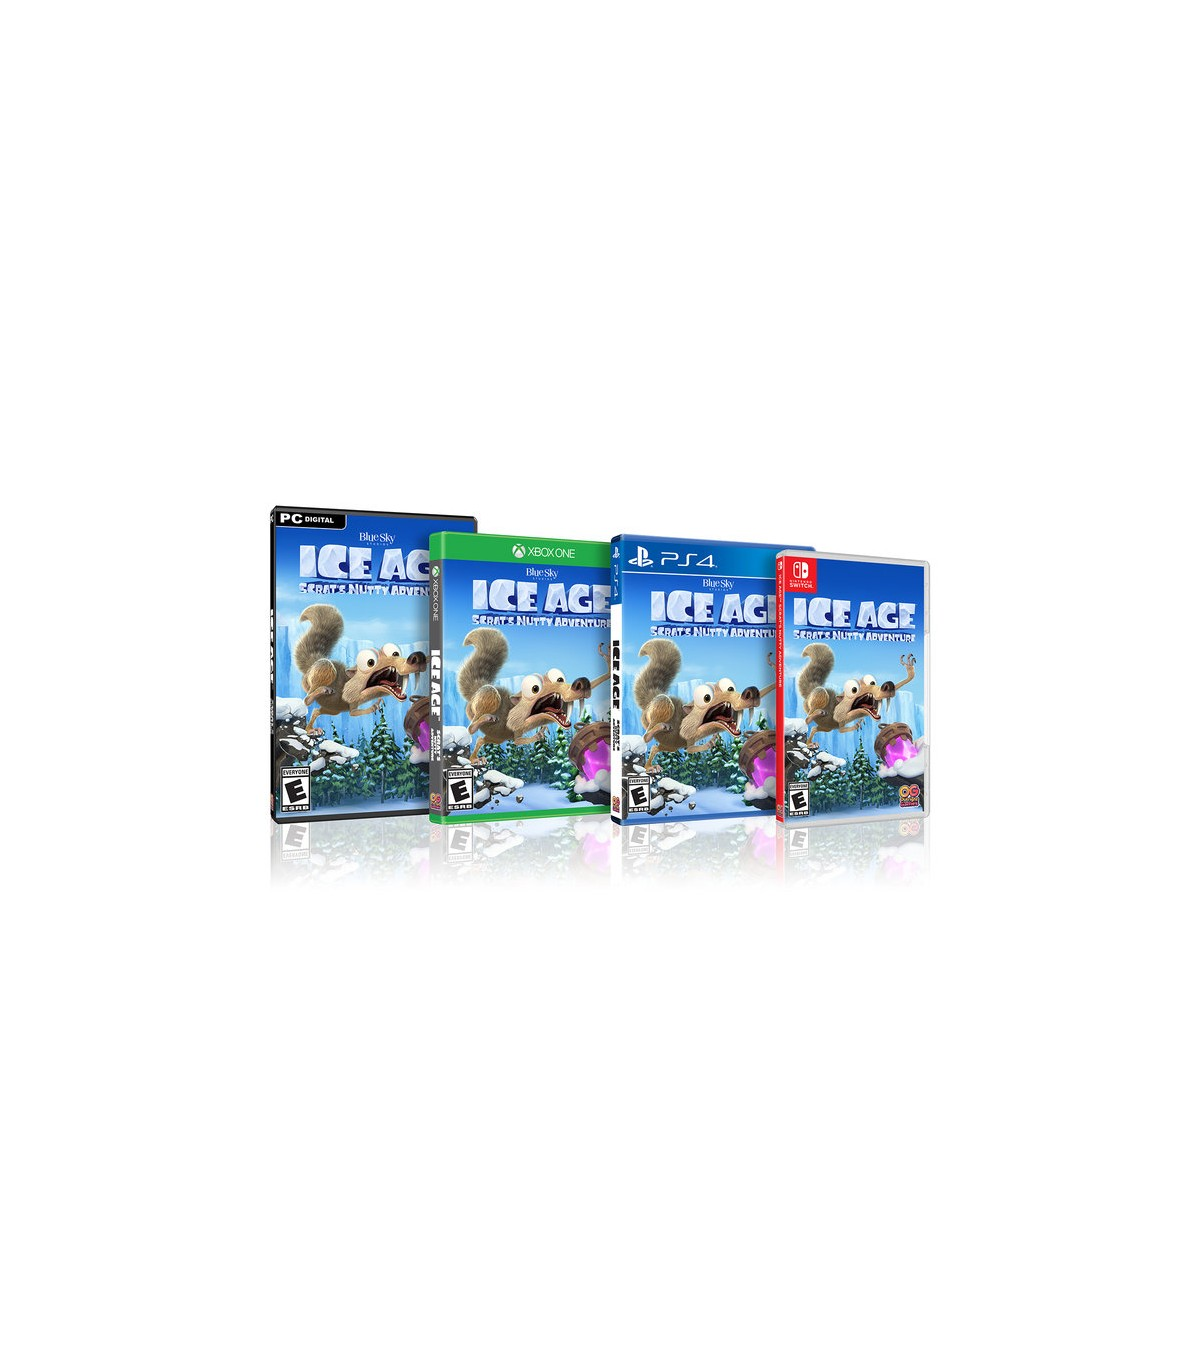 بازی Ice Age Scrat's Nutty Adventure - پلی استیشن 4